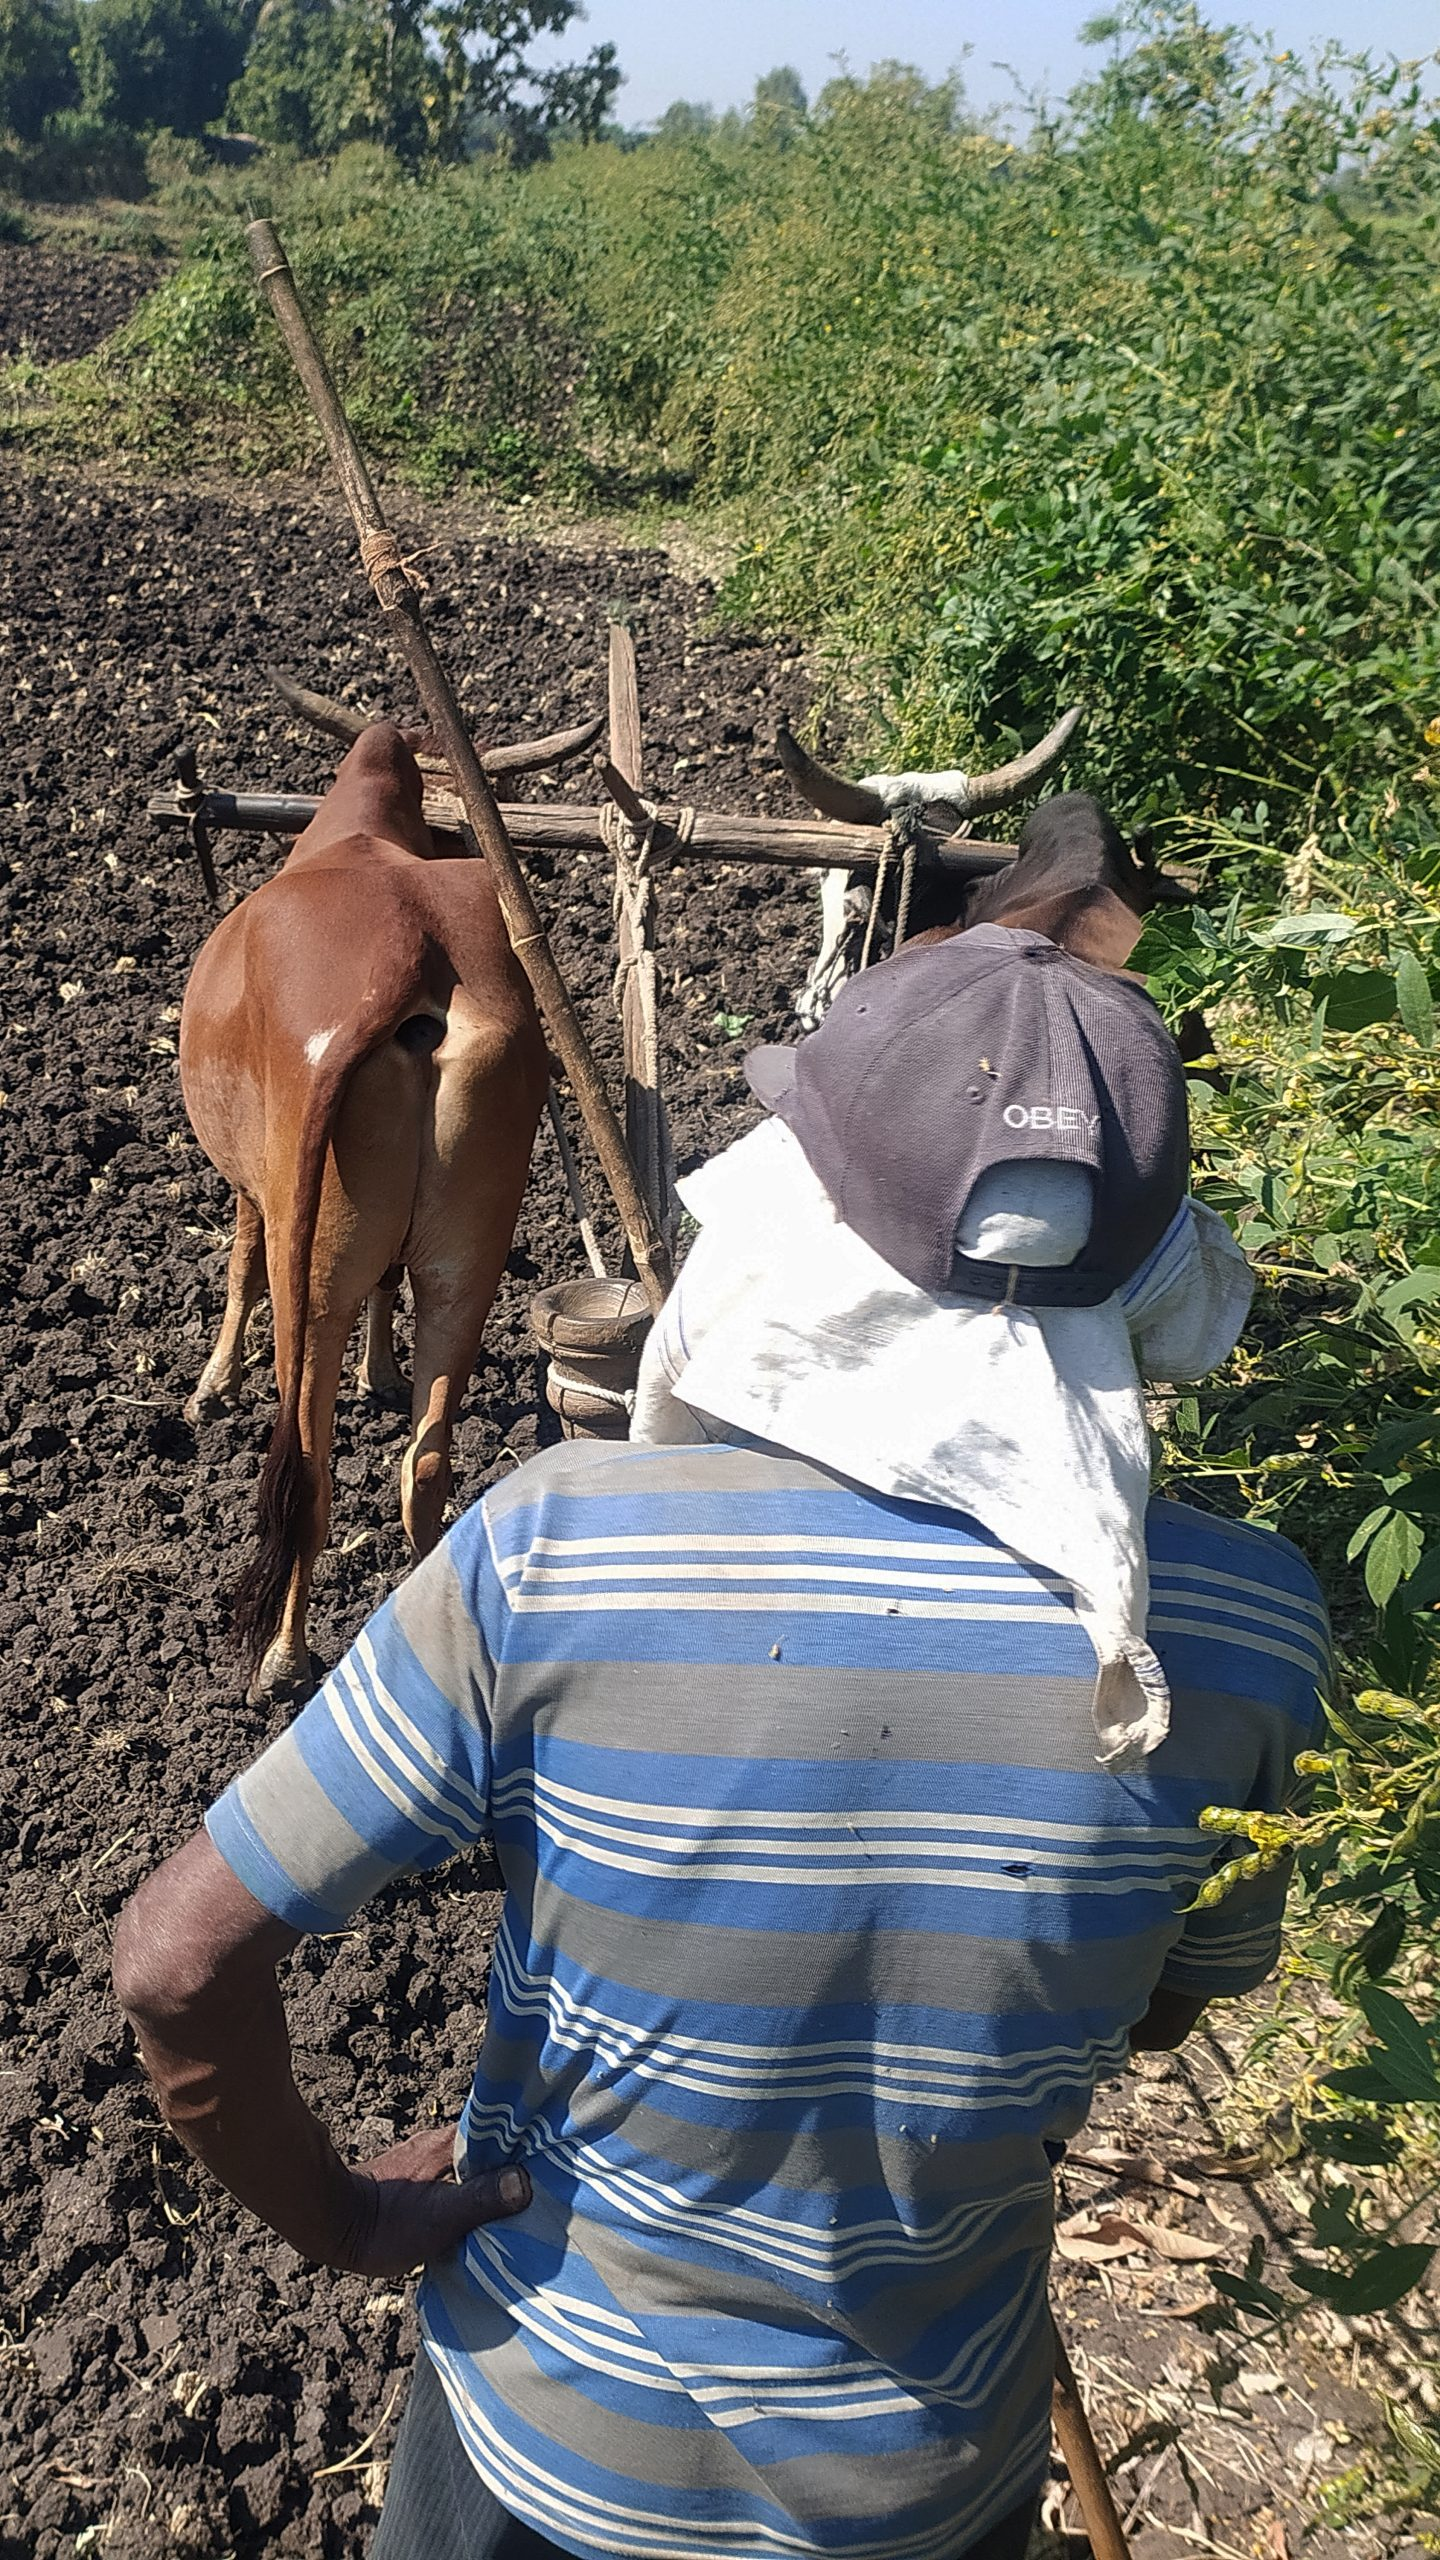 A farmer ploughing with bullocks